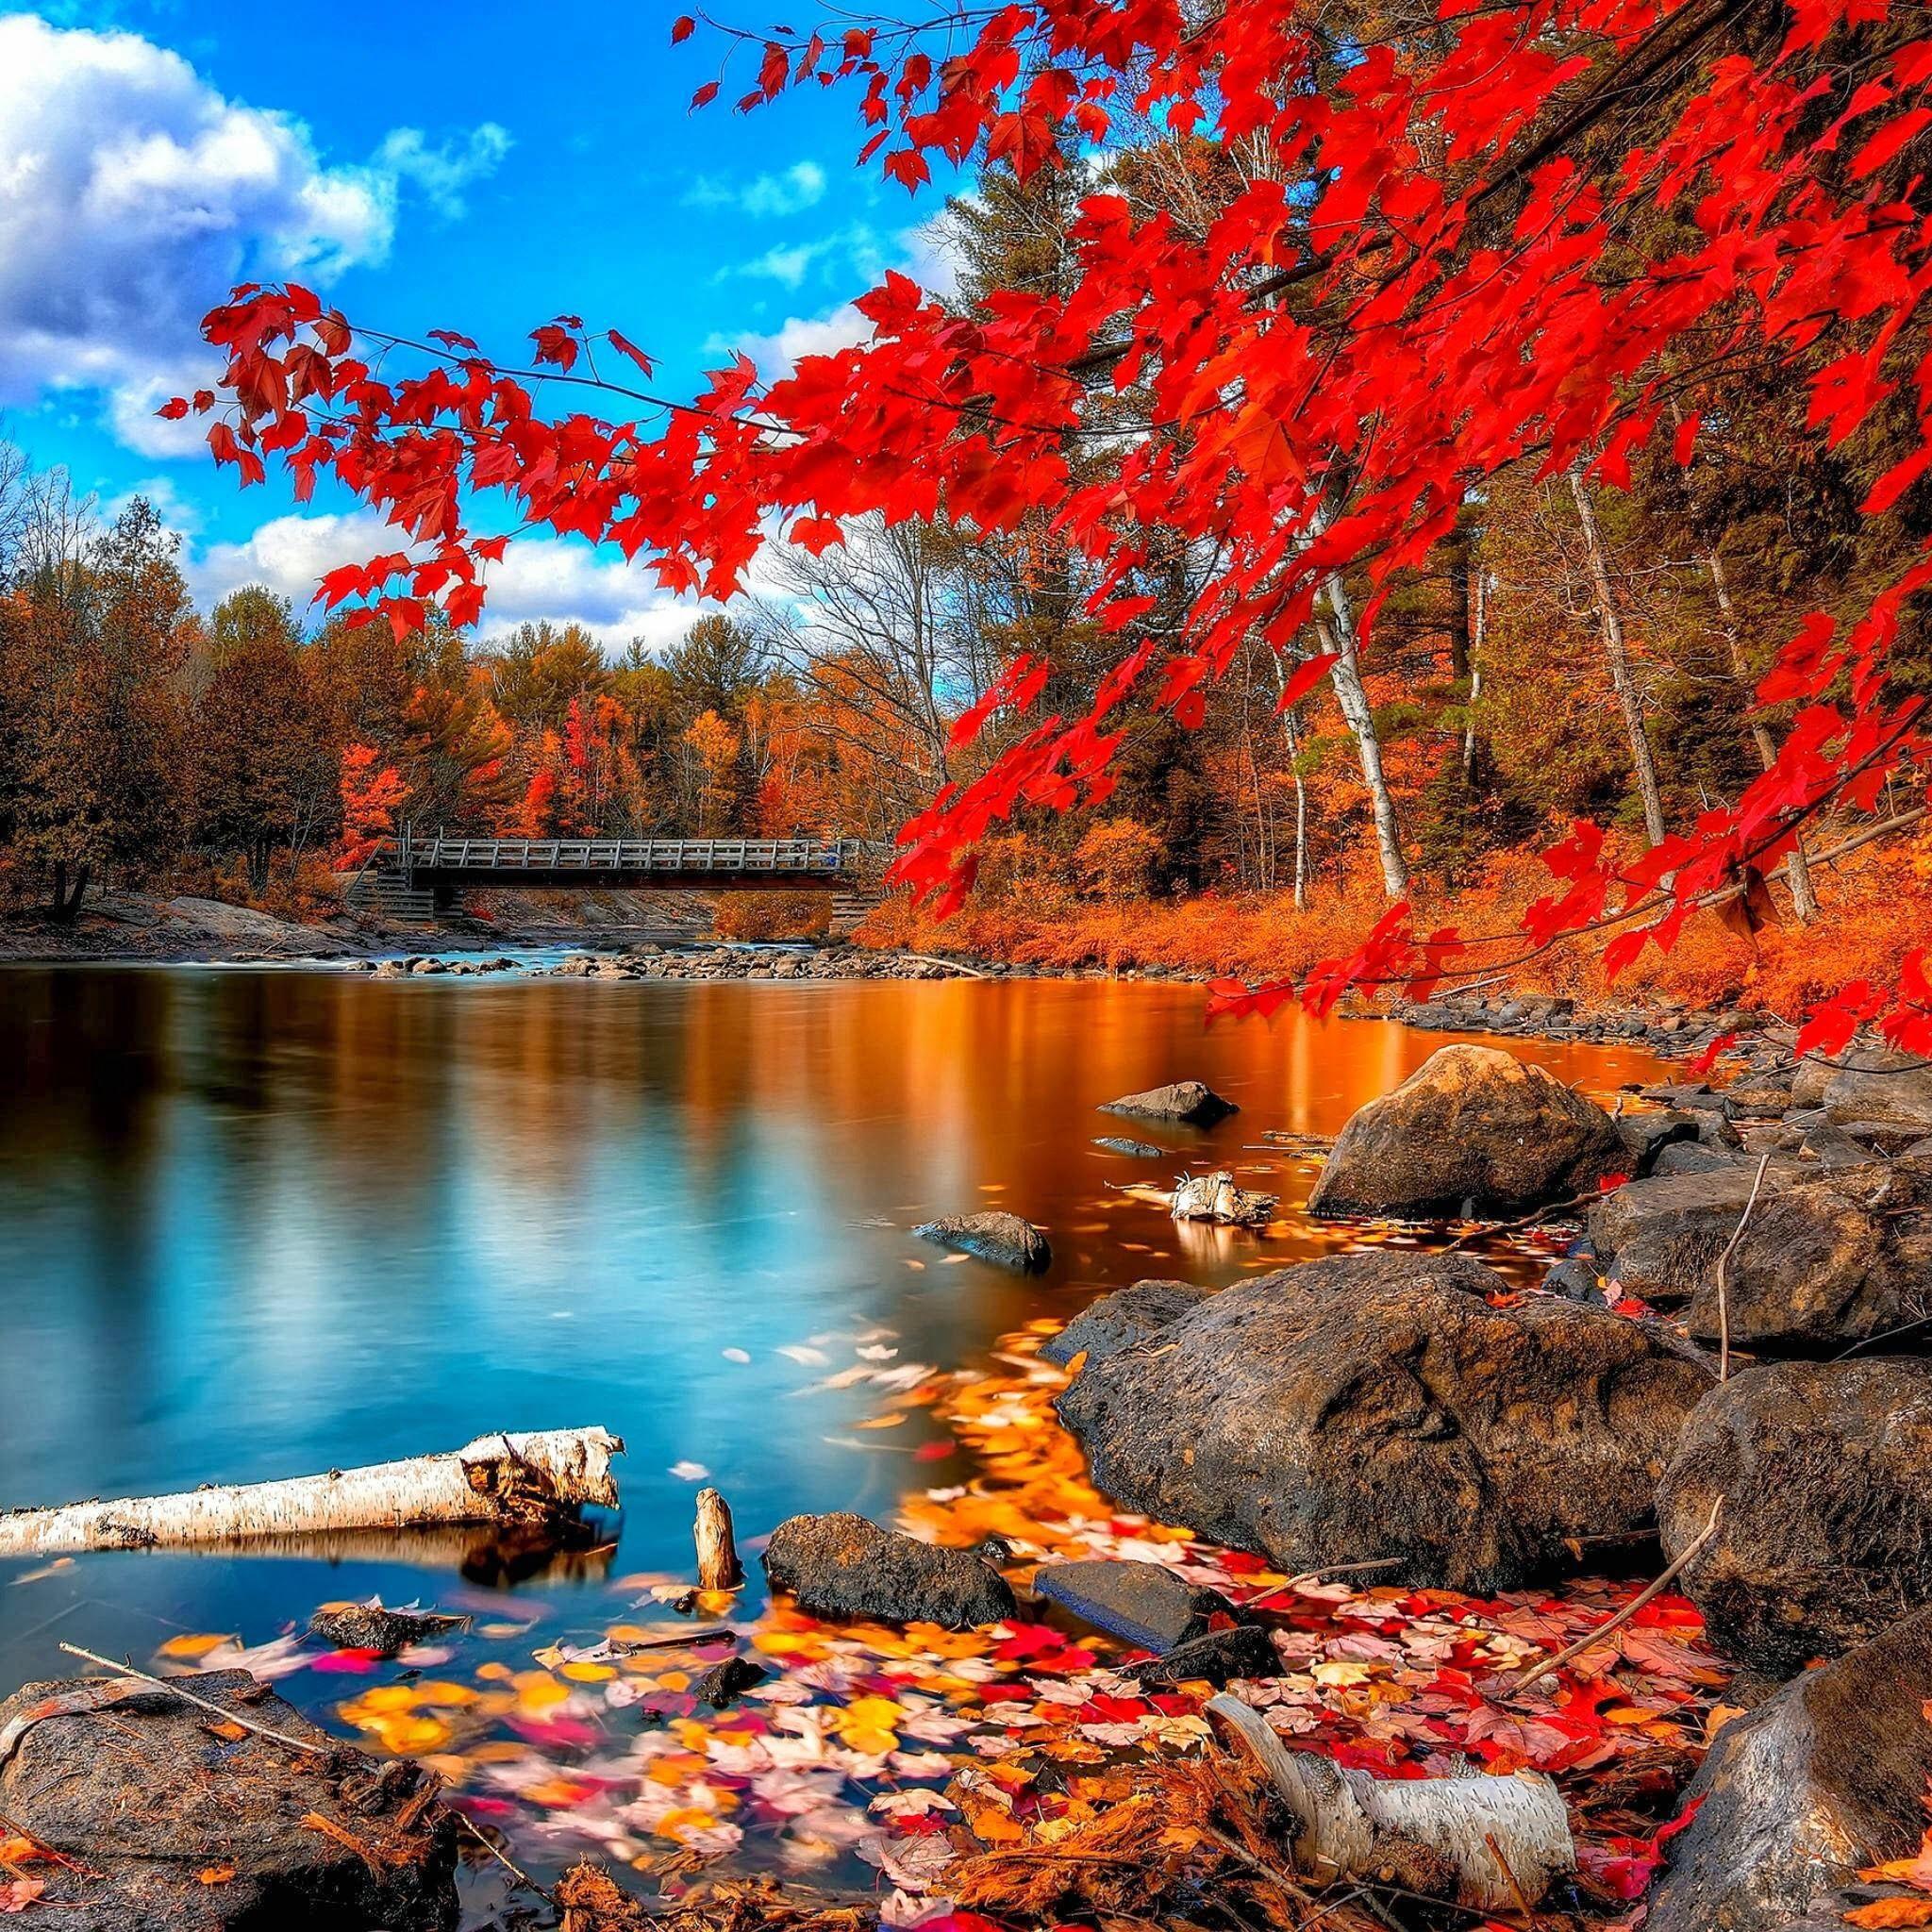 Nature Autumn Red Leaf Calm Lake Landscape Ipad Air